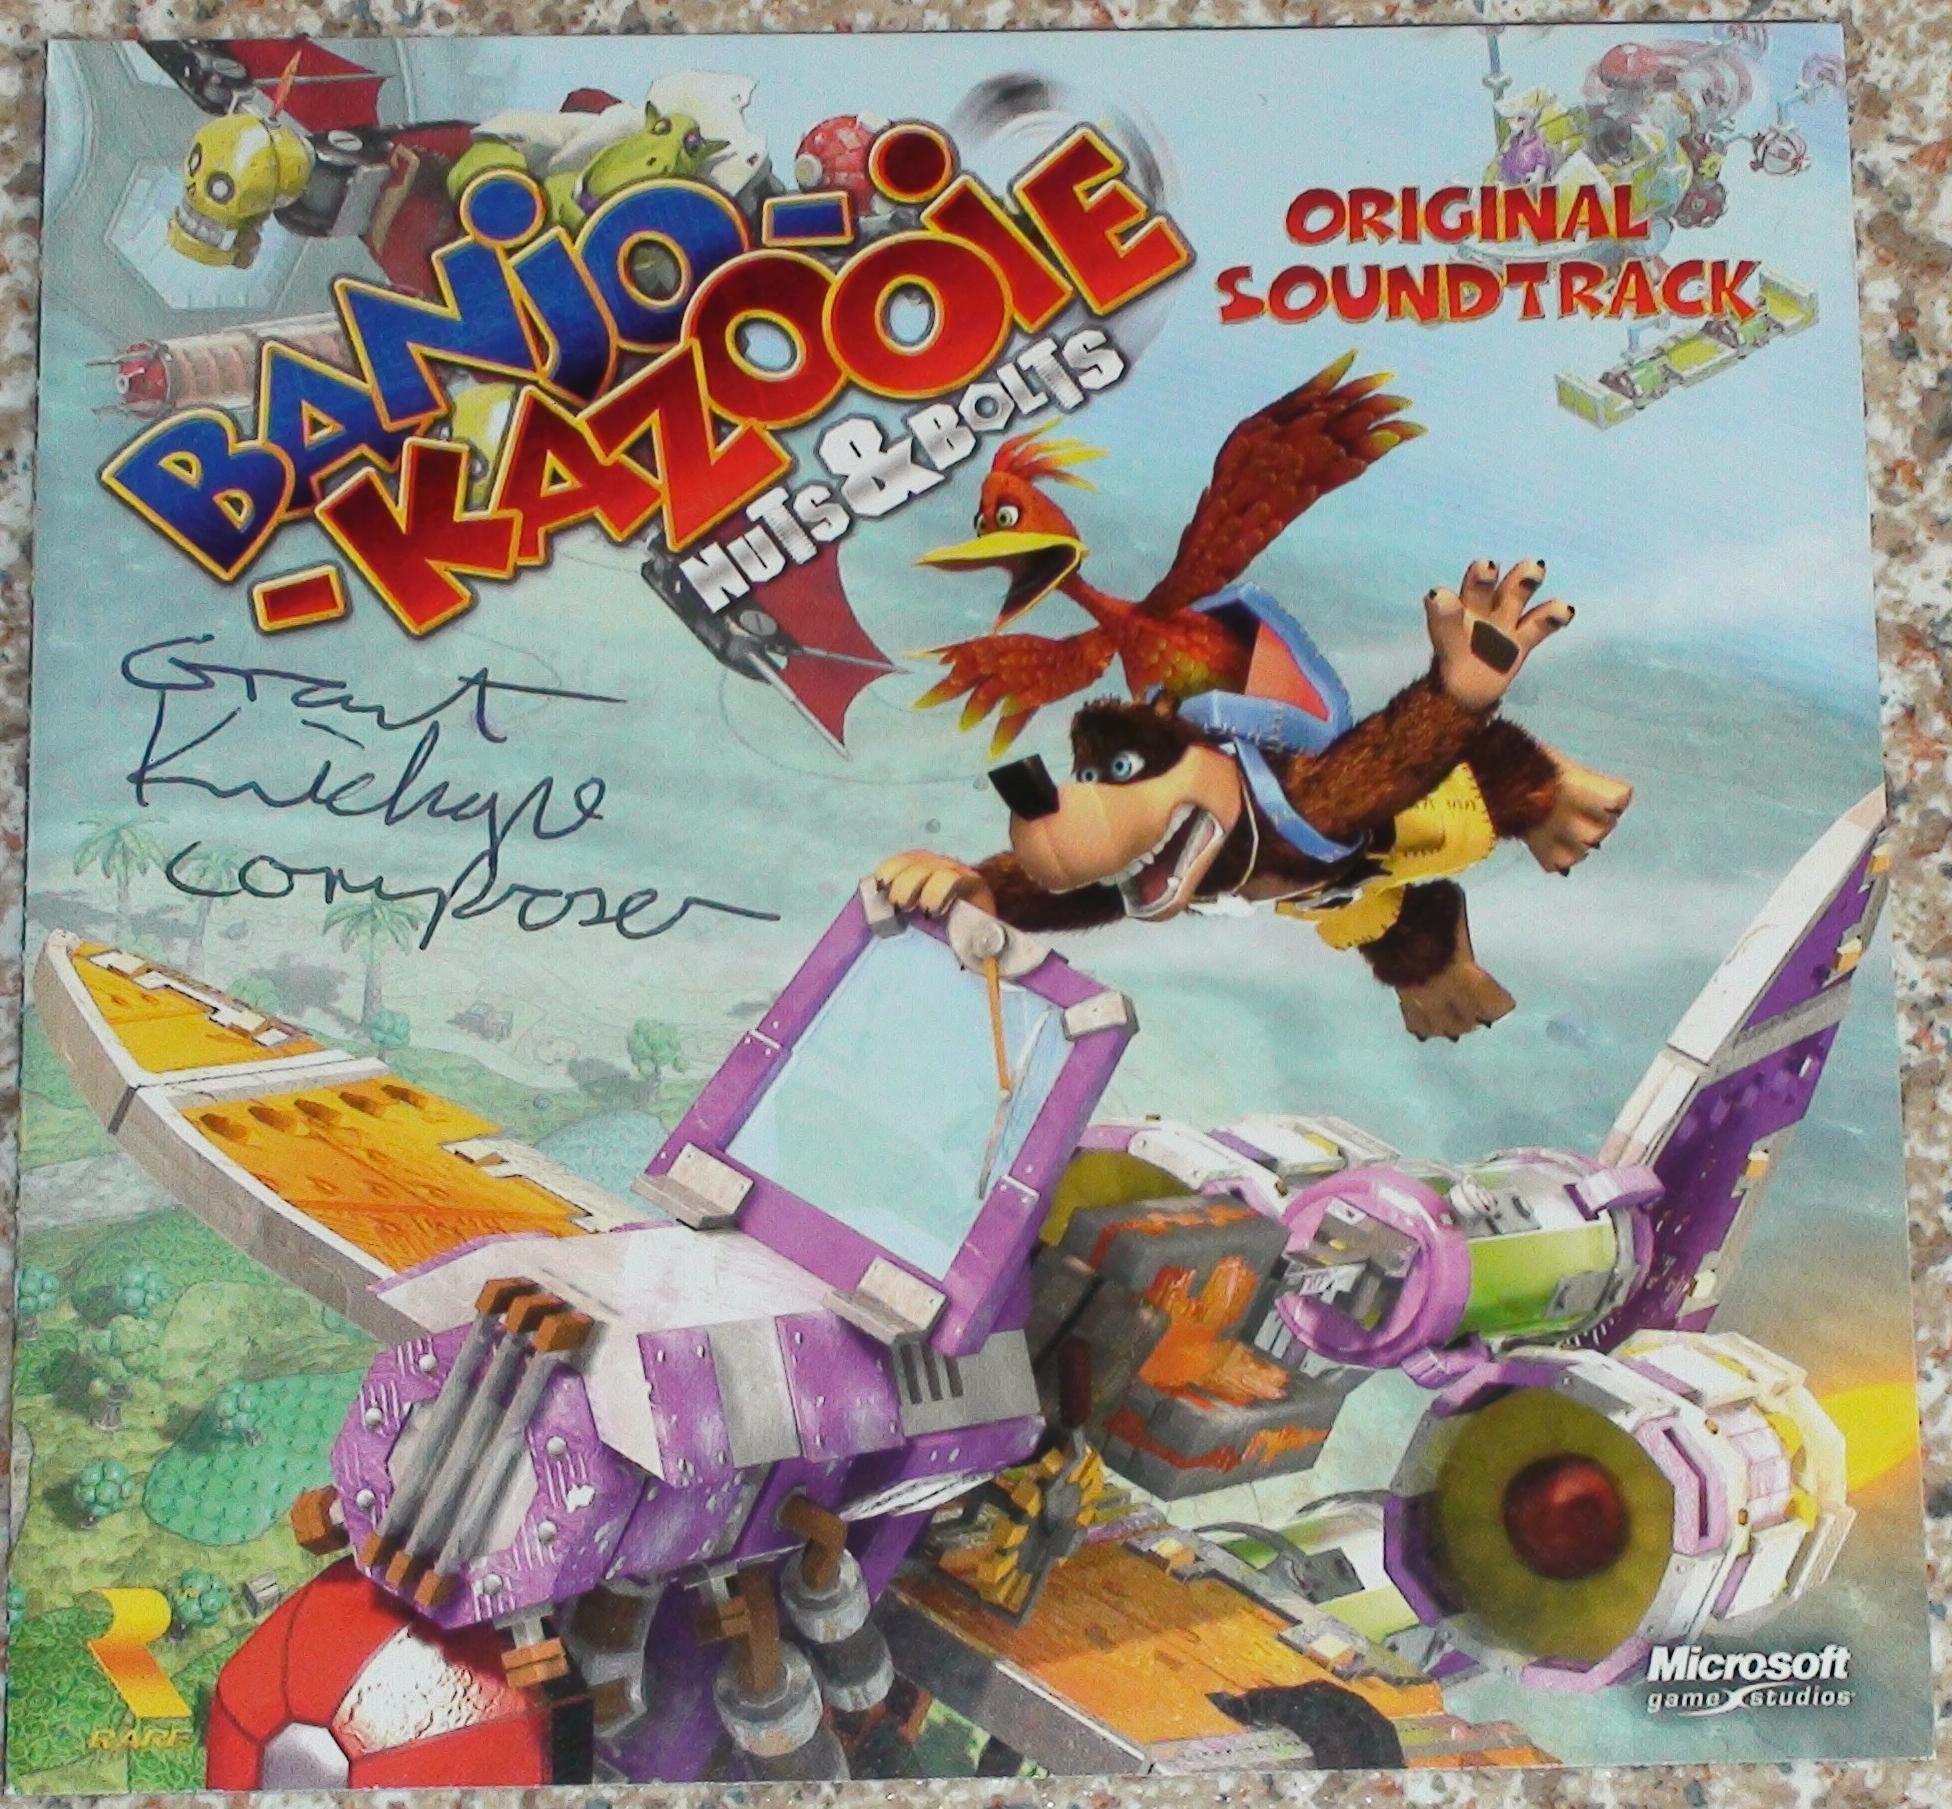 Banjo Kazooie - Grant Kirkhope